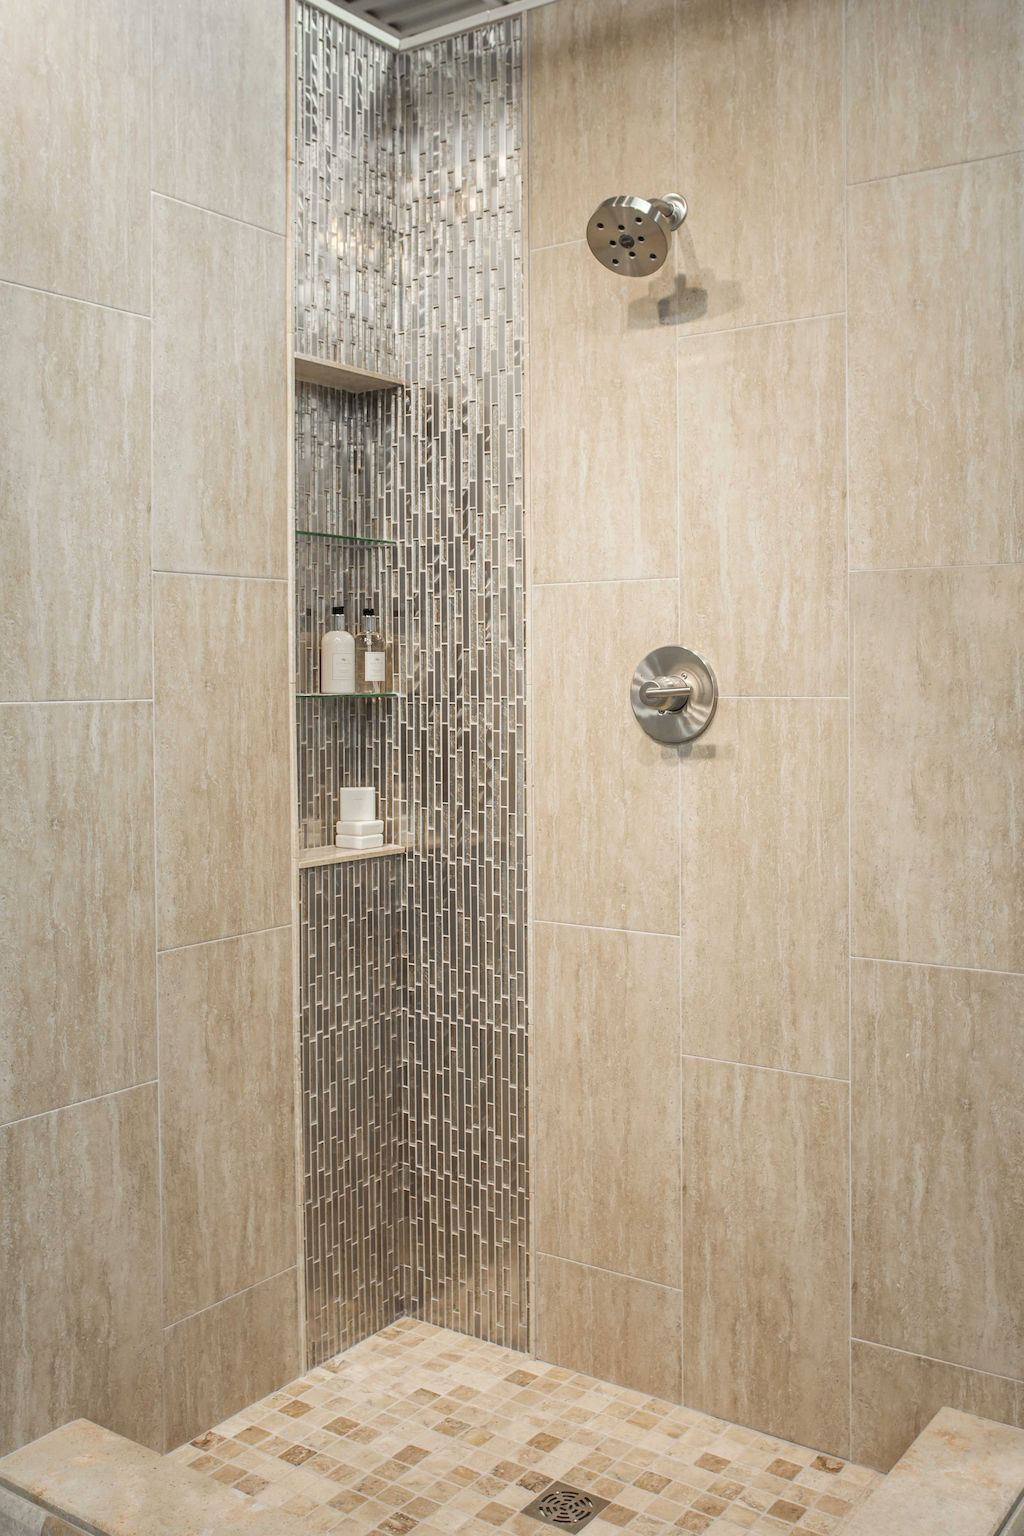 50 beautiful bathroom shower tile ideas (34 | Tile ideas, Tile ...